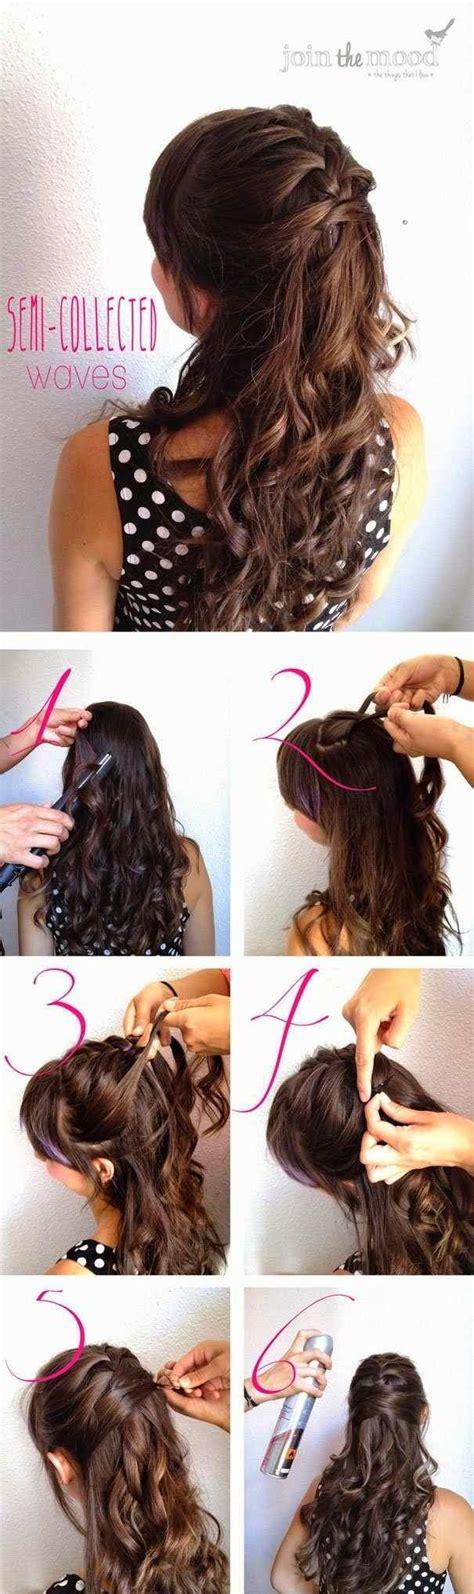 fashionable half up half hairstyles hair tutorials